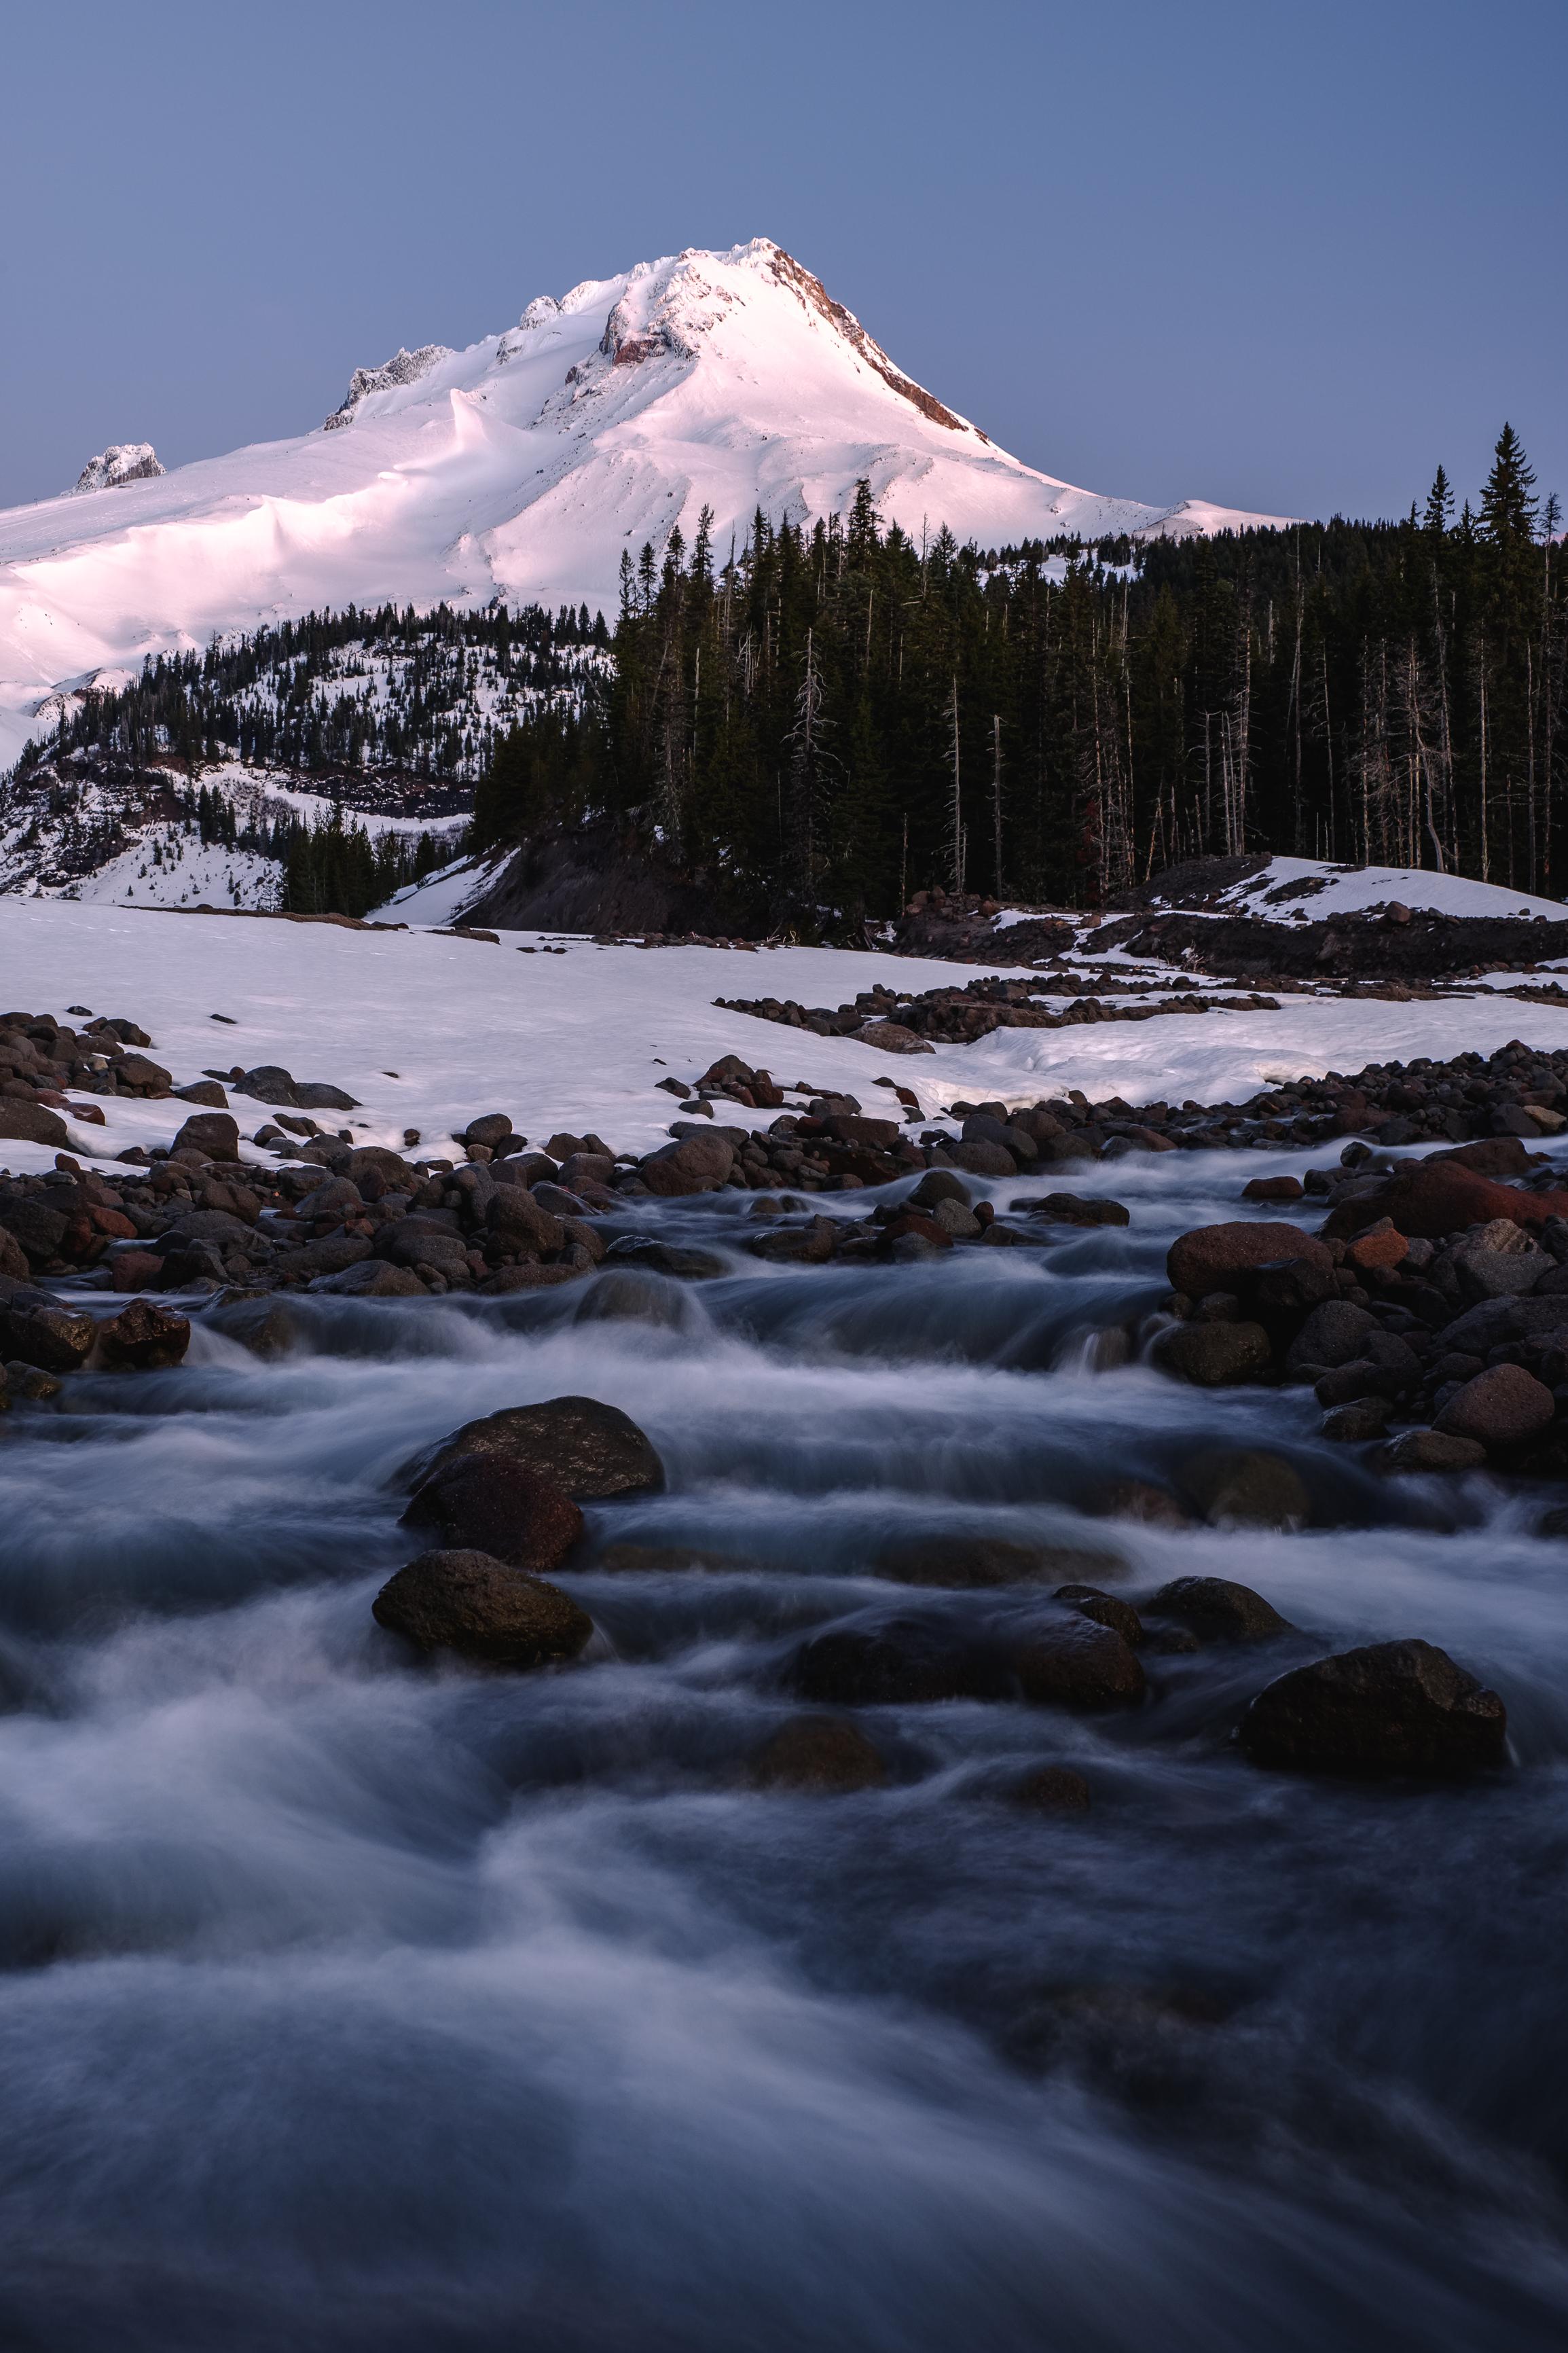 mt hood white river snow winter